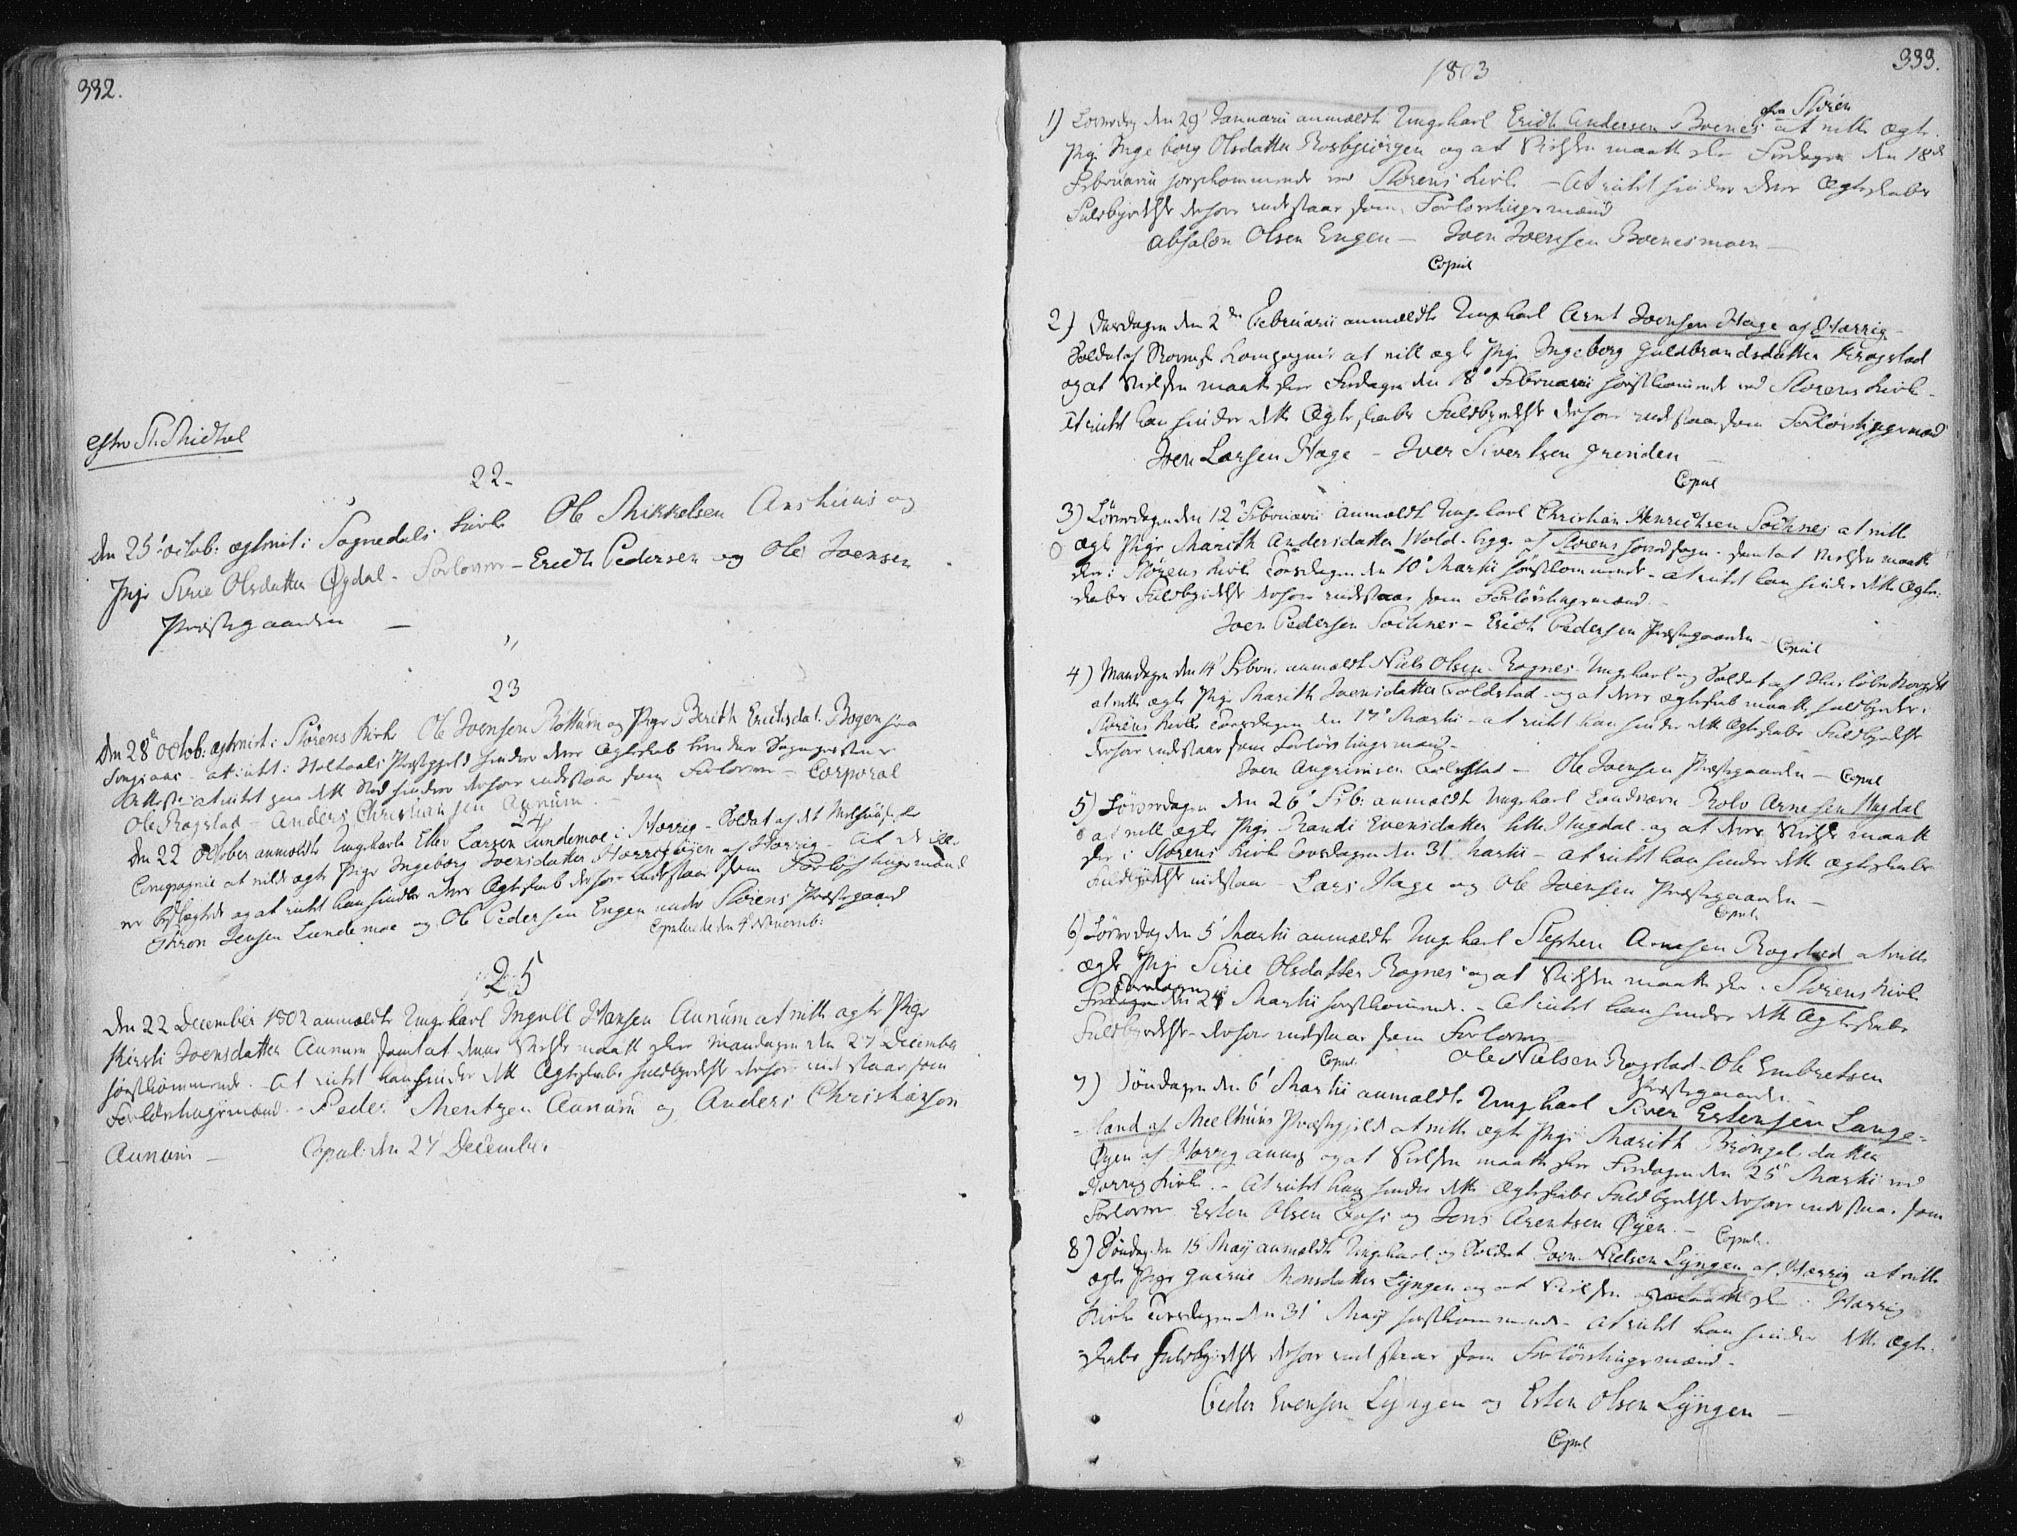 SAT, Ministerialprotokoller, klokkerbøker og fødselsregistre - Sør-Trøndelag, 687/L0992: Parish register (official) no. 687A03 /1, 1788-1815, p. 332-333